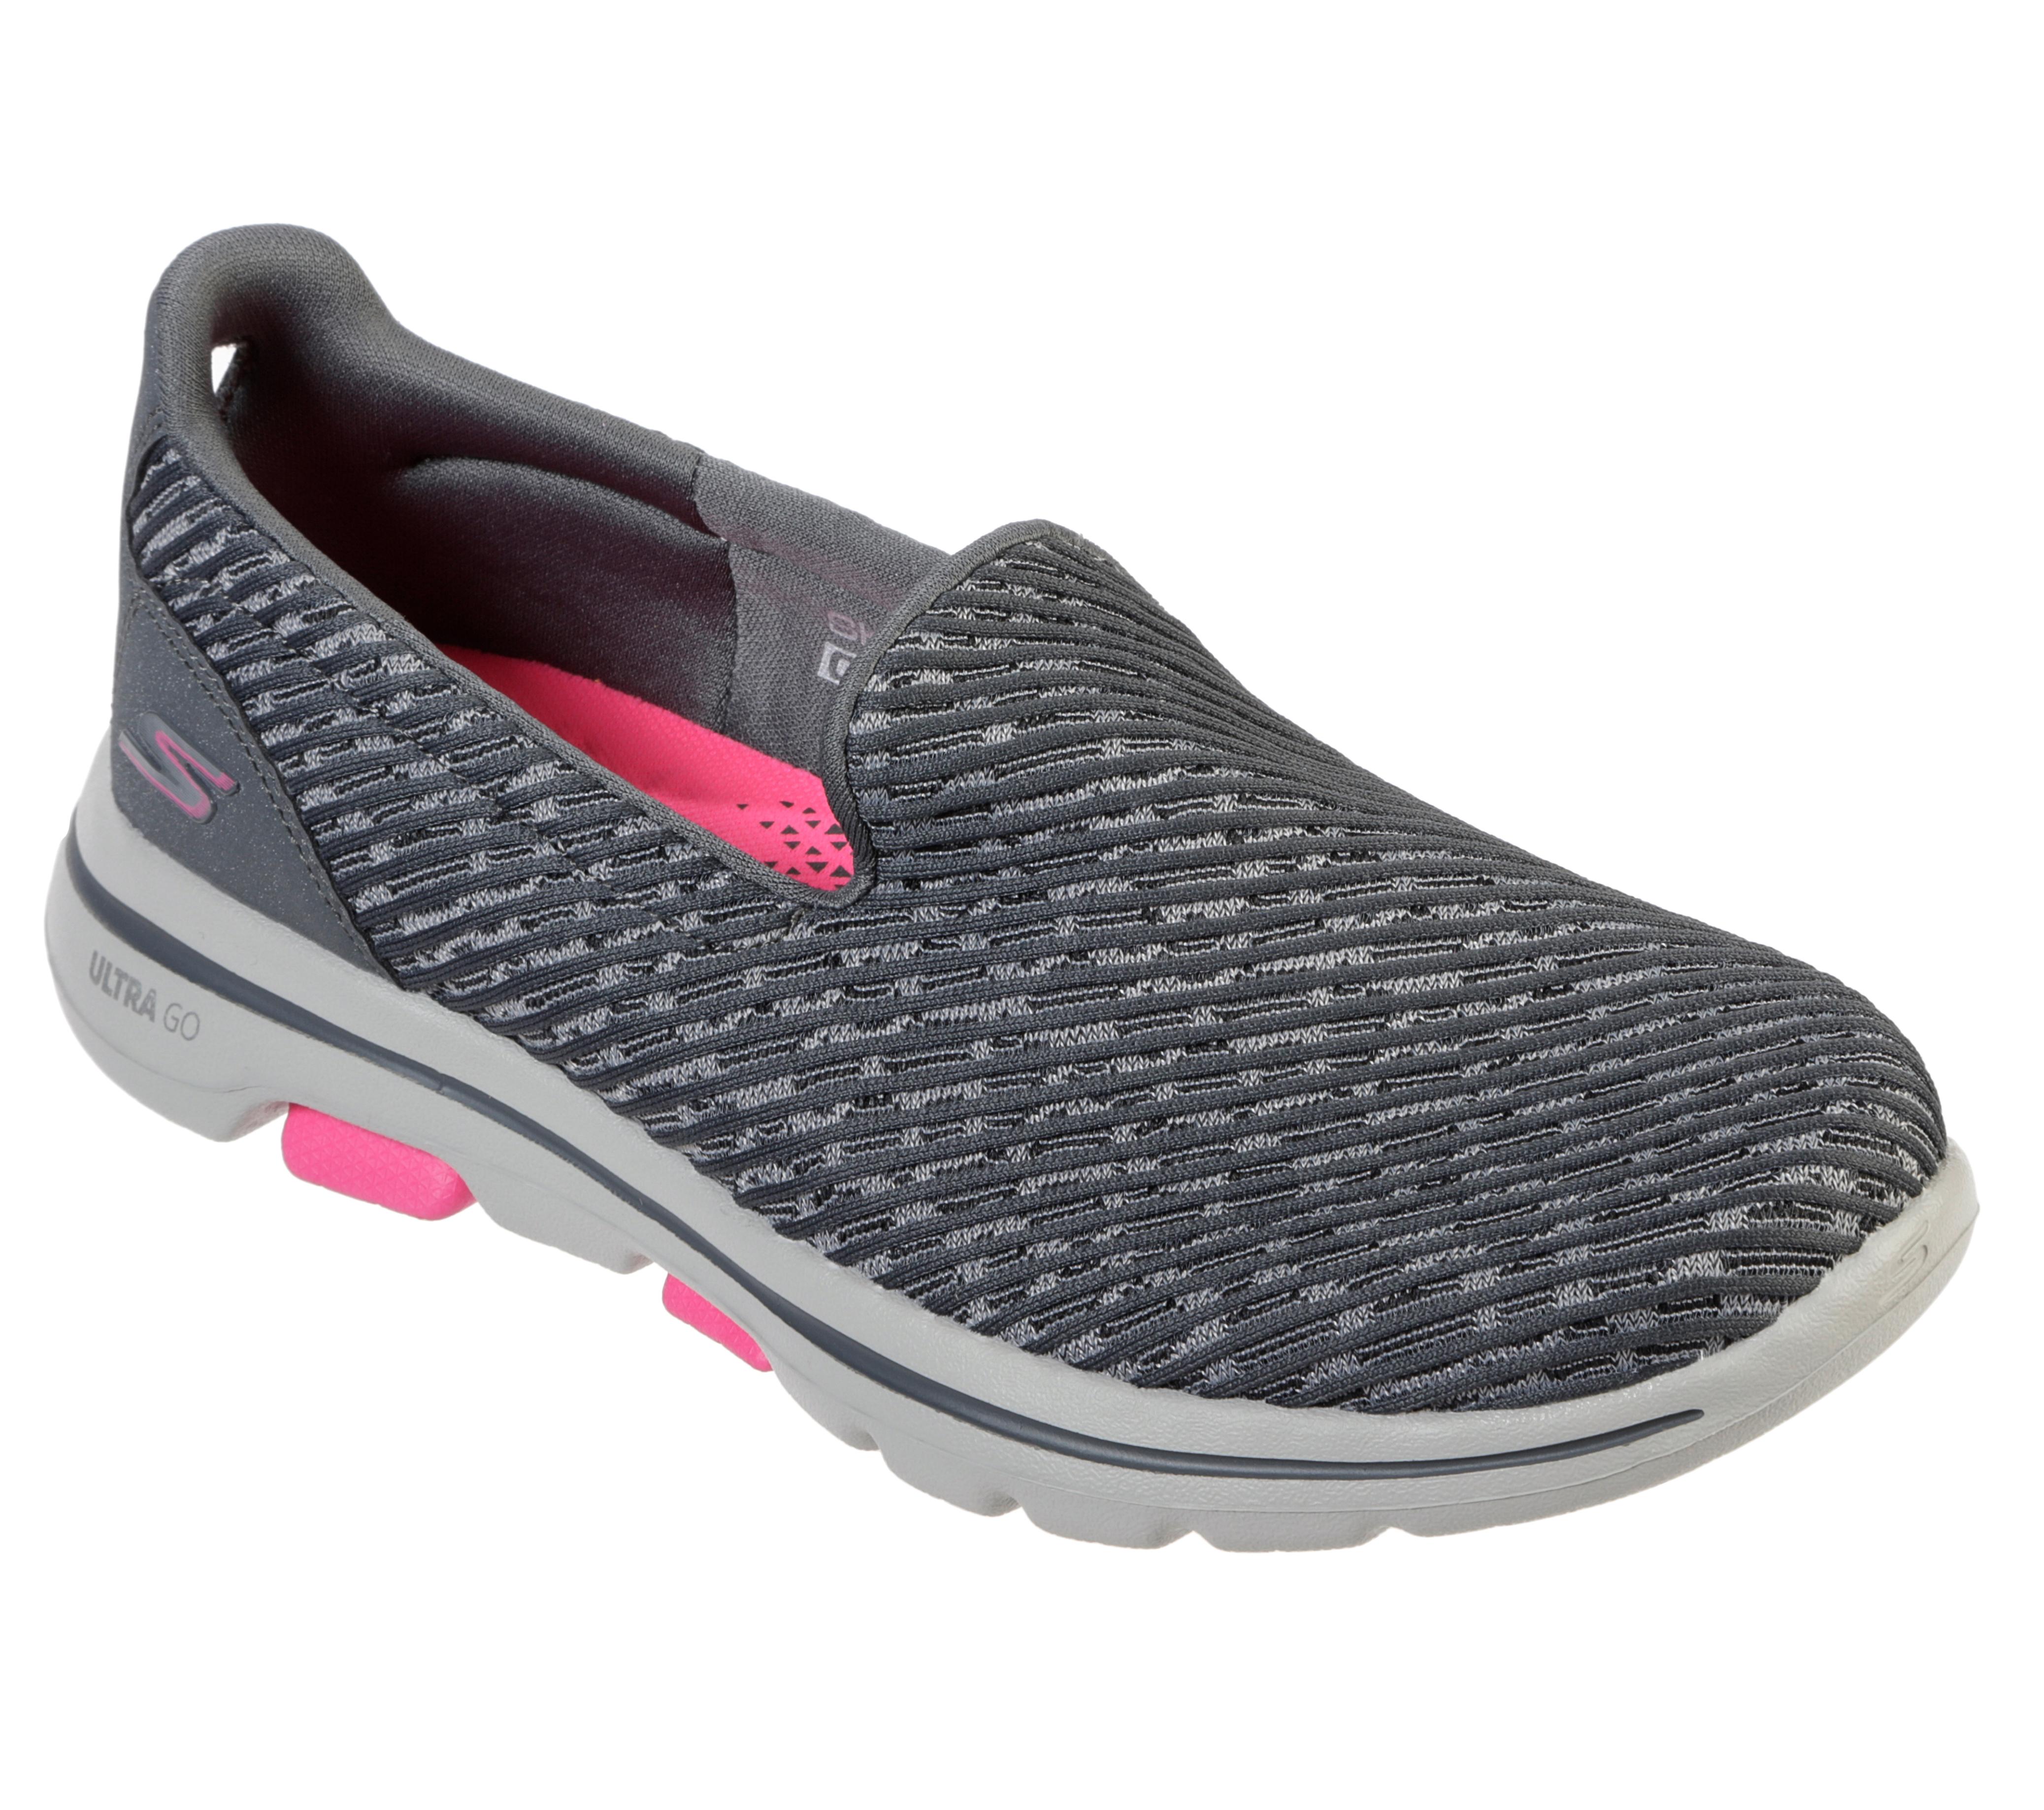 Womens Skechers GO Walk 5 Slip On Grey/Pink